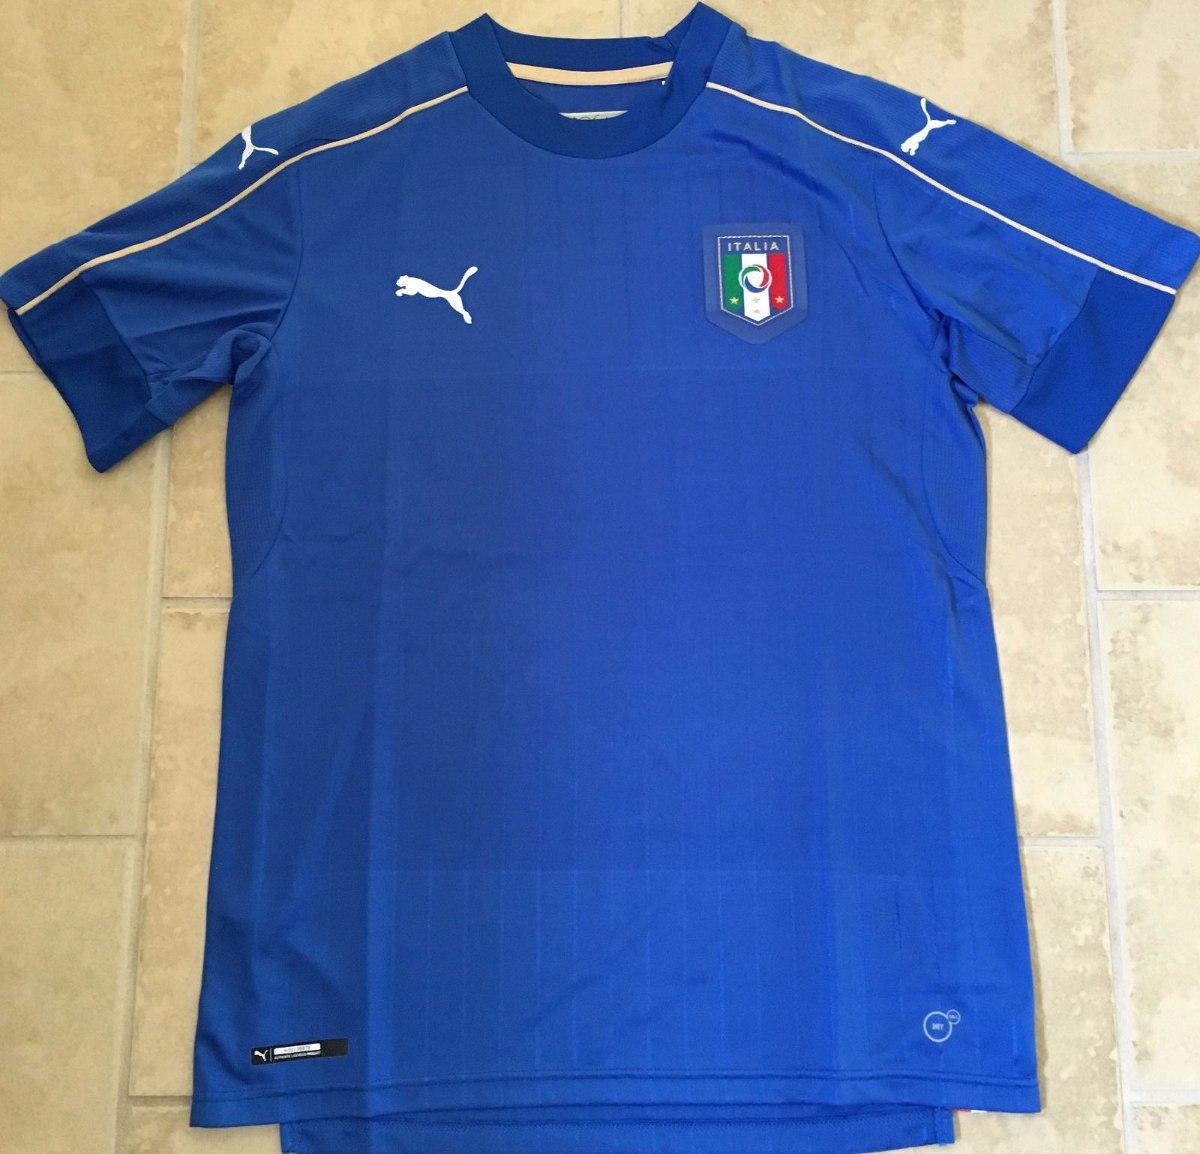 9318b173ec Camiseta Fútbol Selección Italia 2016 Versión De Local -   22.000 en ...